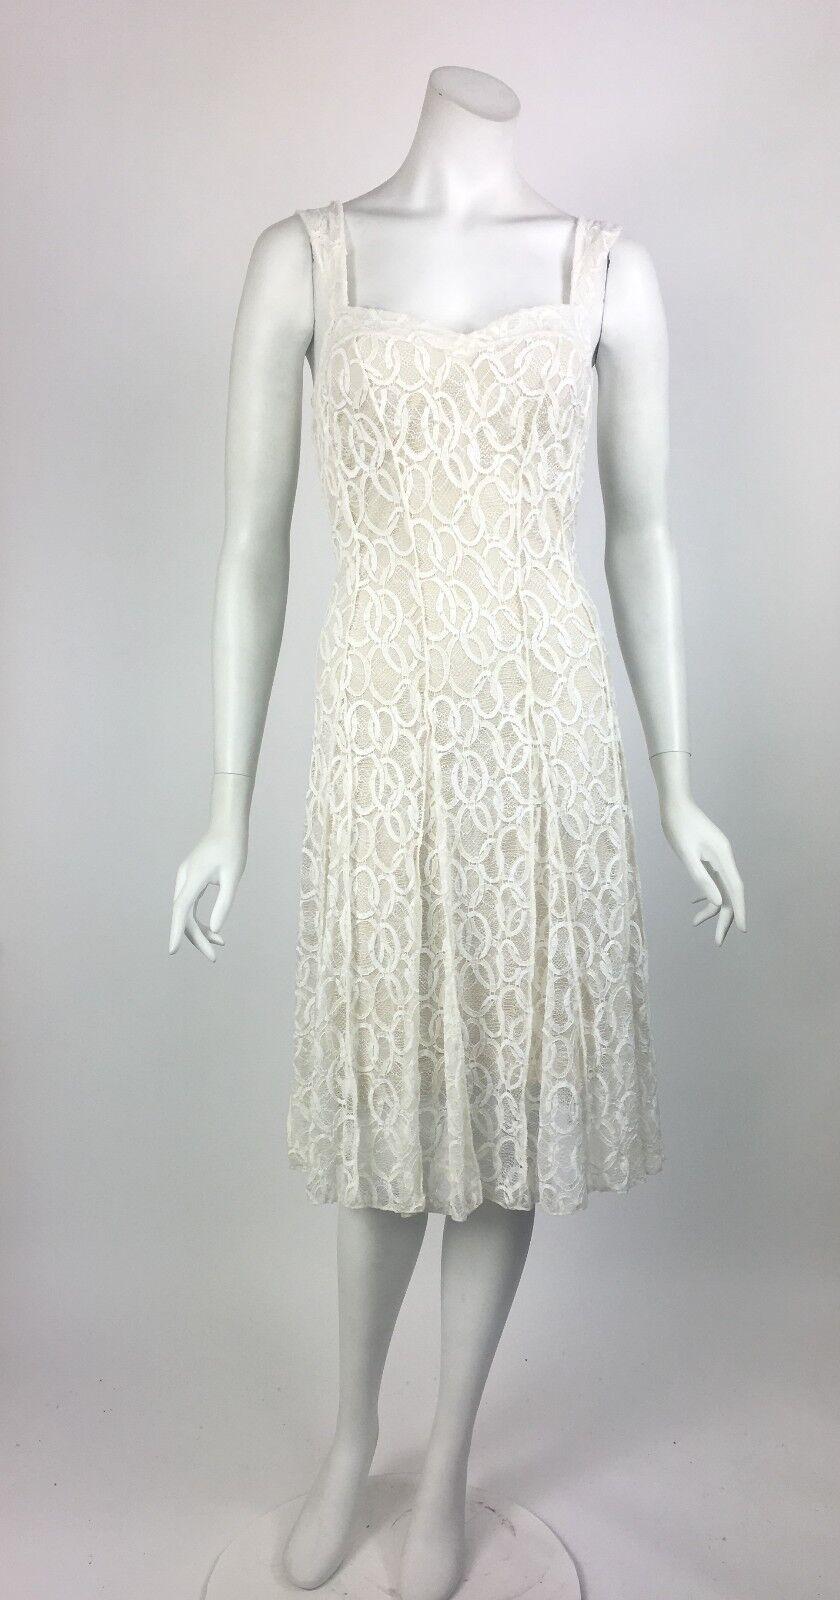 Elana Kattan Sleeveless Flared Ivory Lace Dress Wedding Bridal NWT NWT NWT Sz Small 2e7c80